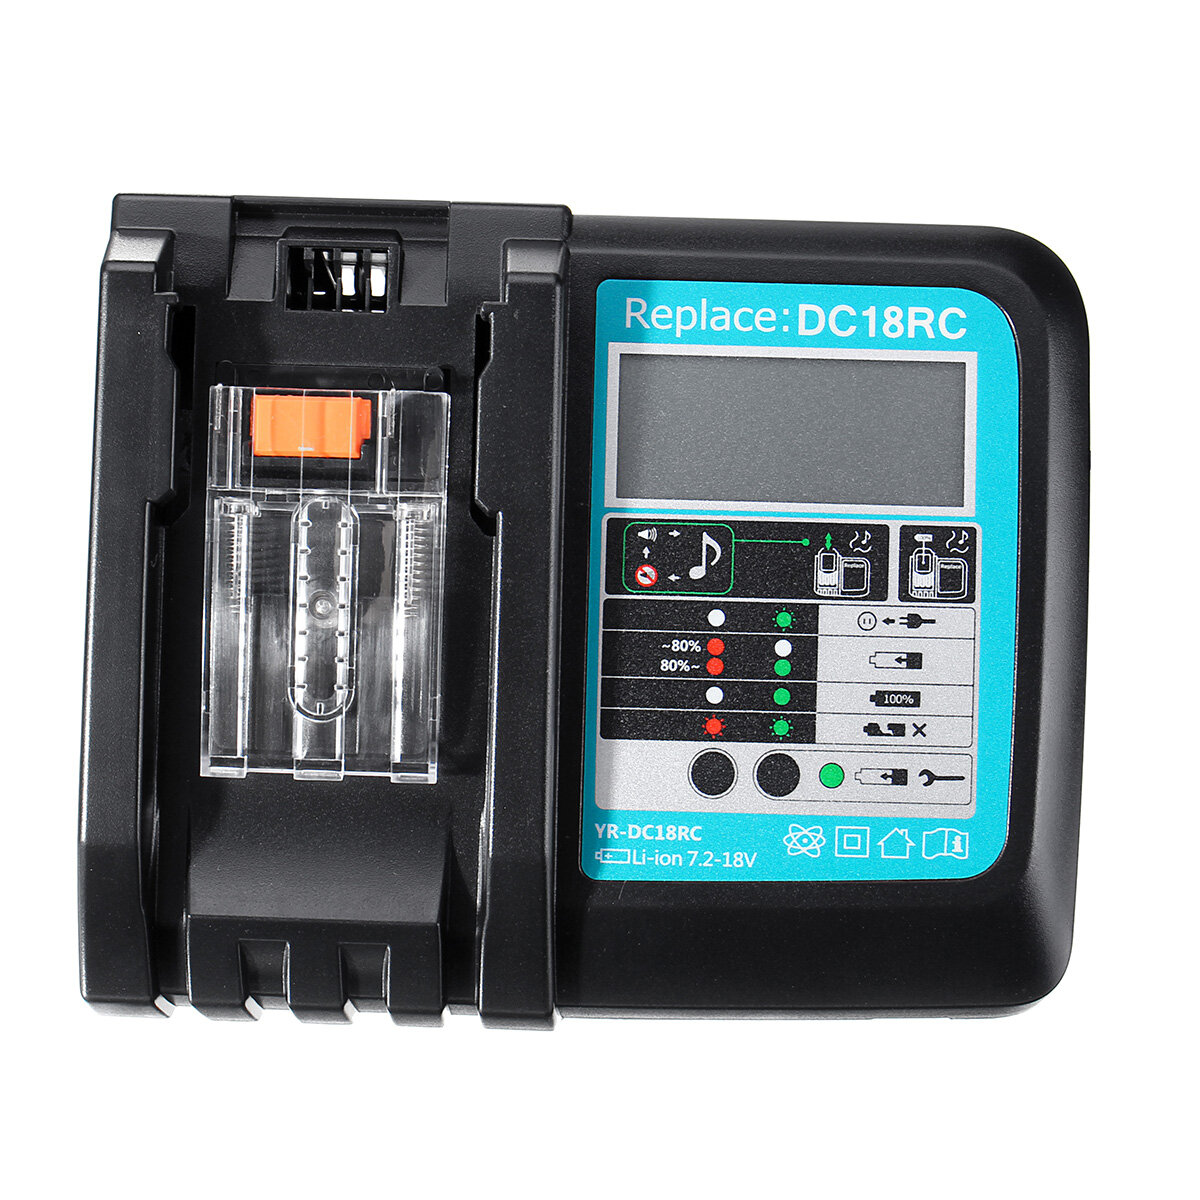 DC18RC फास्ट लीथियम-आयन बैटरी चार्जर BL1830 BL1840 BL1850 Makita बैटरी के लिए